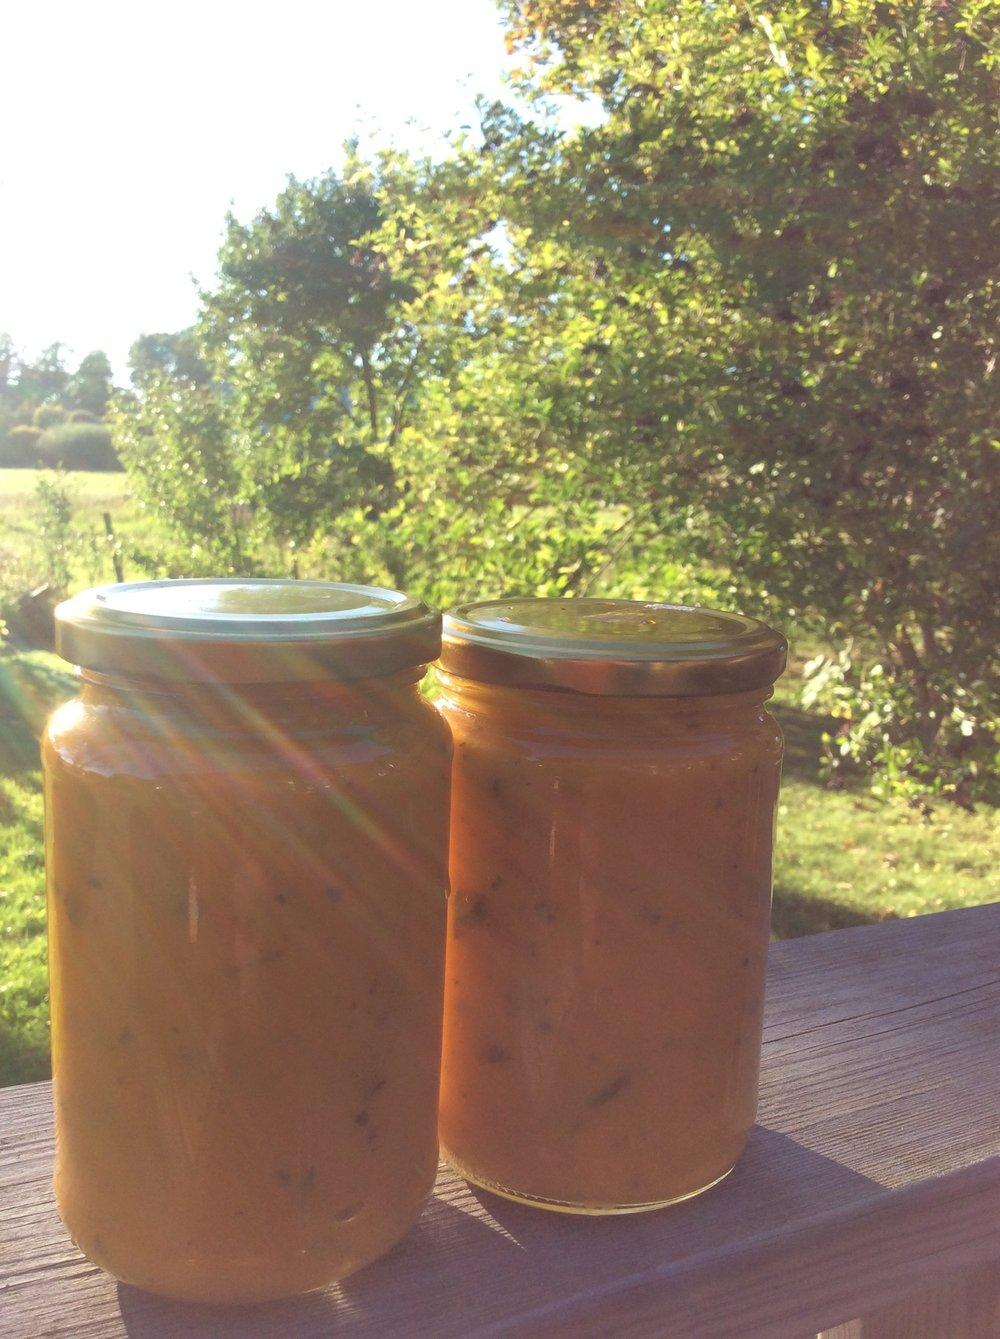 Golden Prana -livsenergi- i överflöd i sommarens tomatsås <3